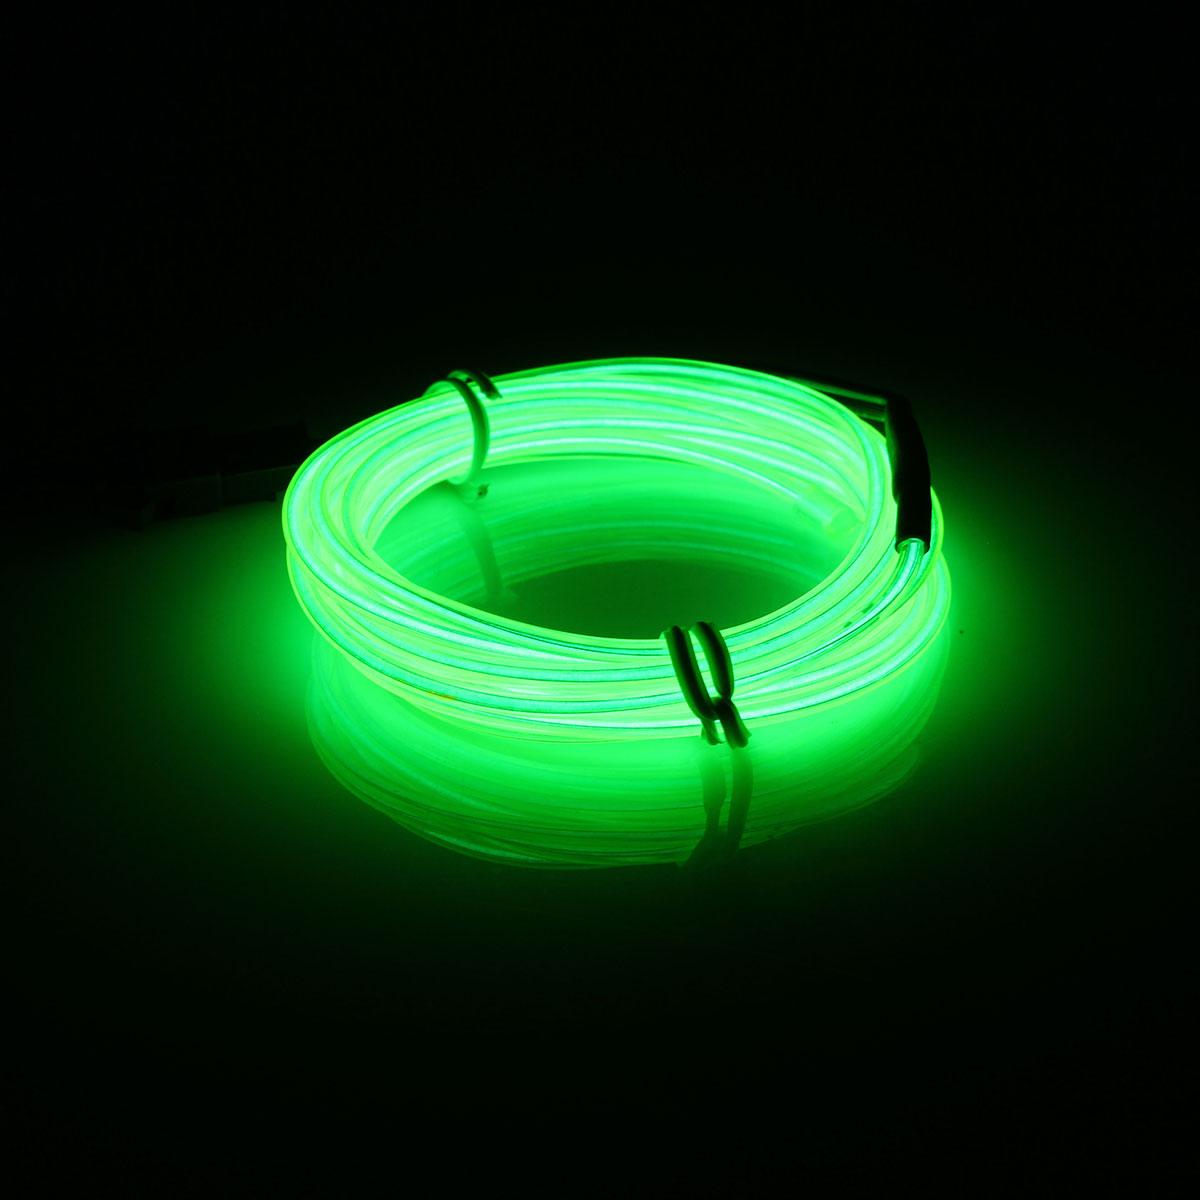 2m led flexible neon light glow el strip tube cool wire rope home car decor ebay. Black Bedroom Furniture Sets. Home Design Ideas